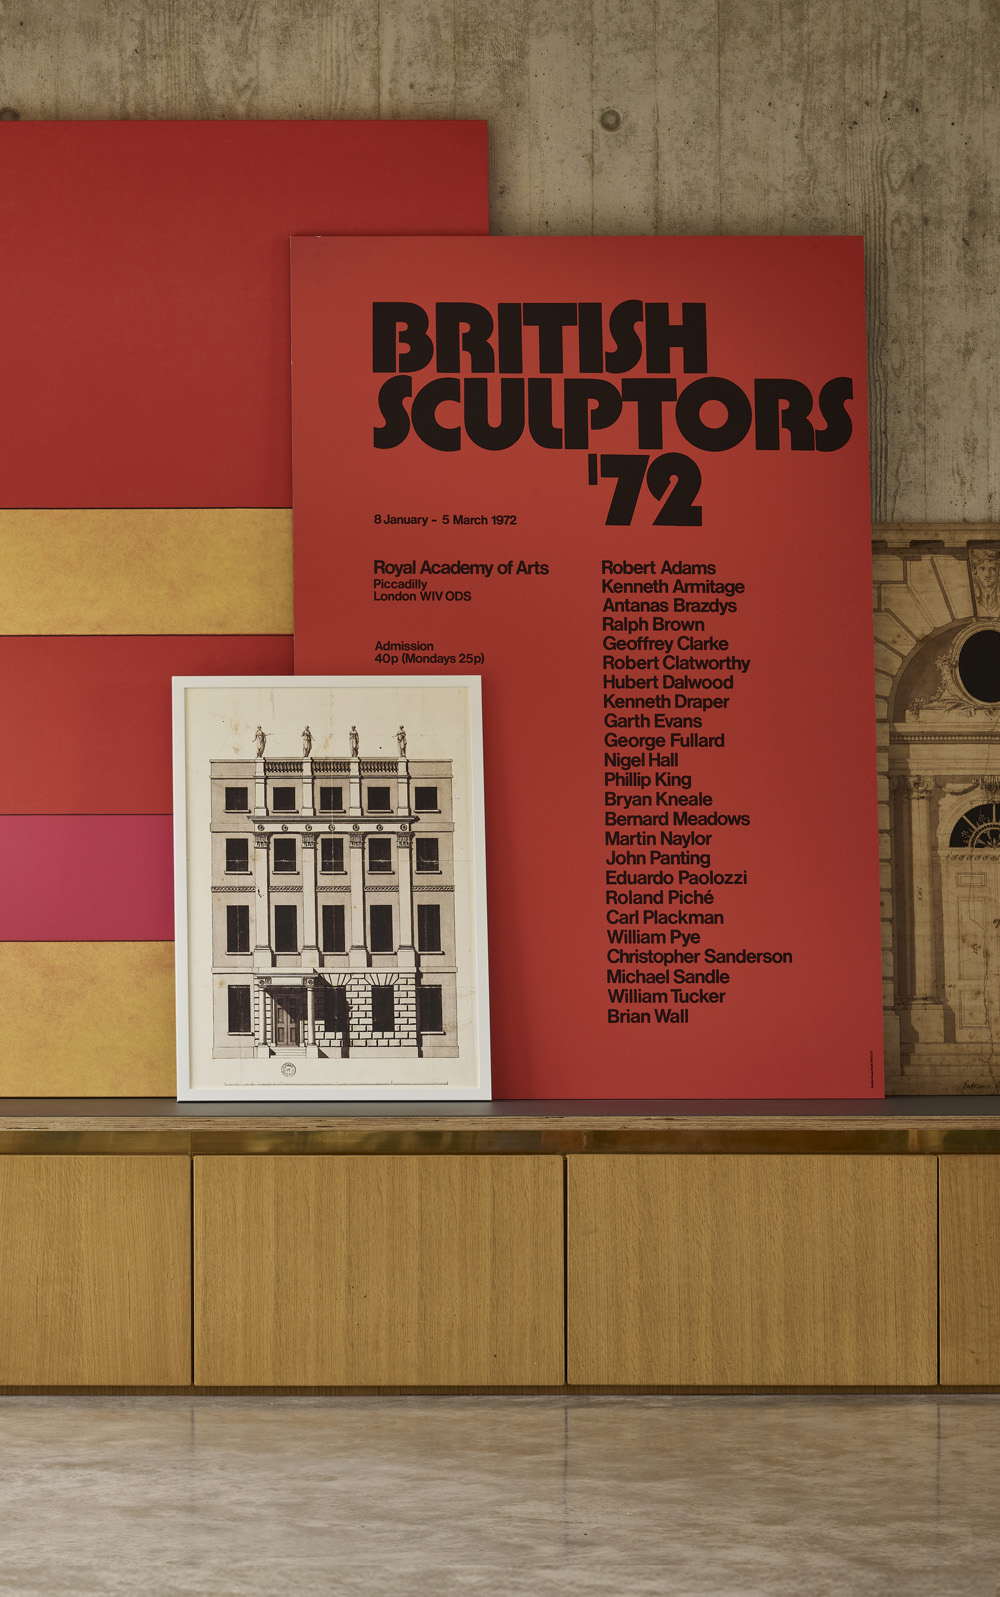 RA British Sculptors Exhibition 1972 Epic Poster